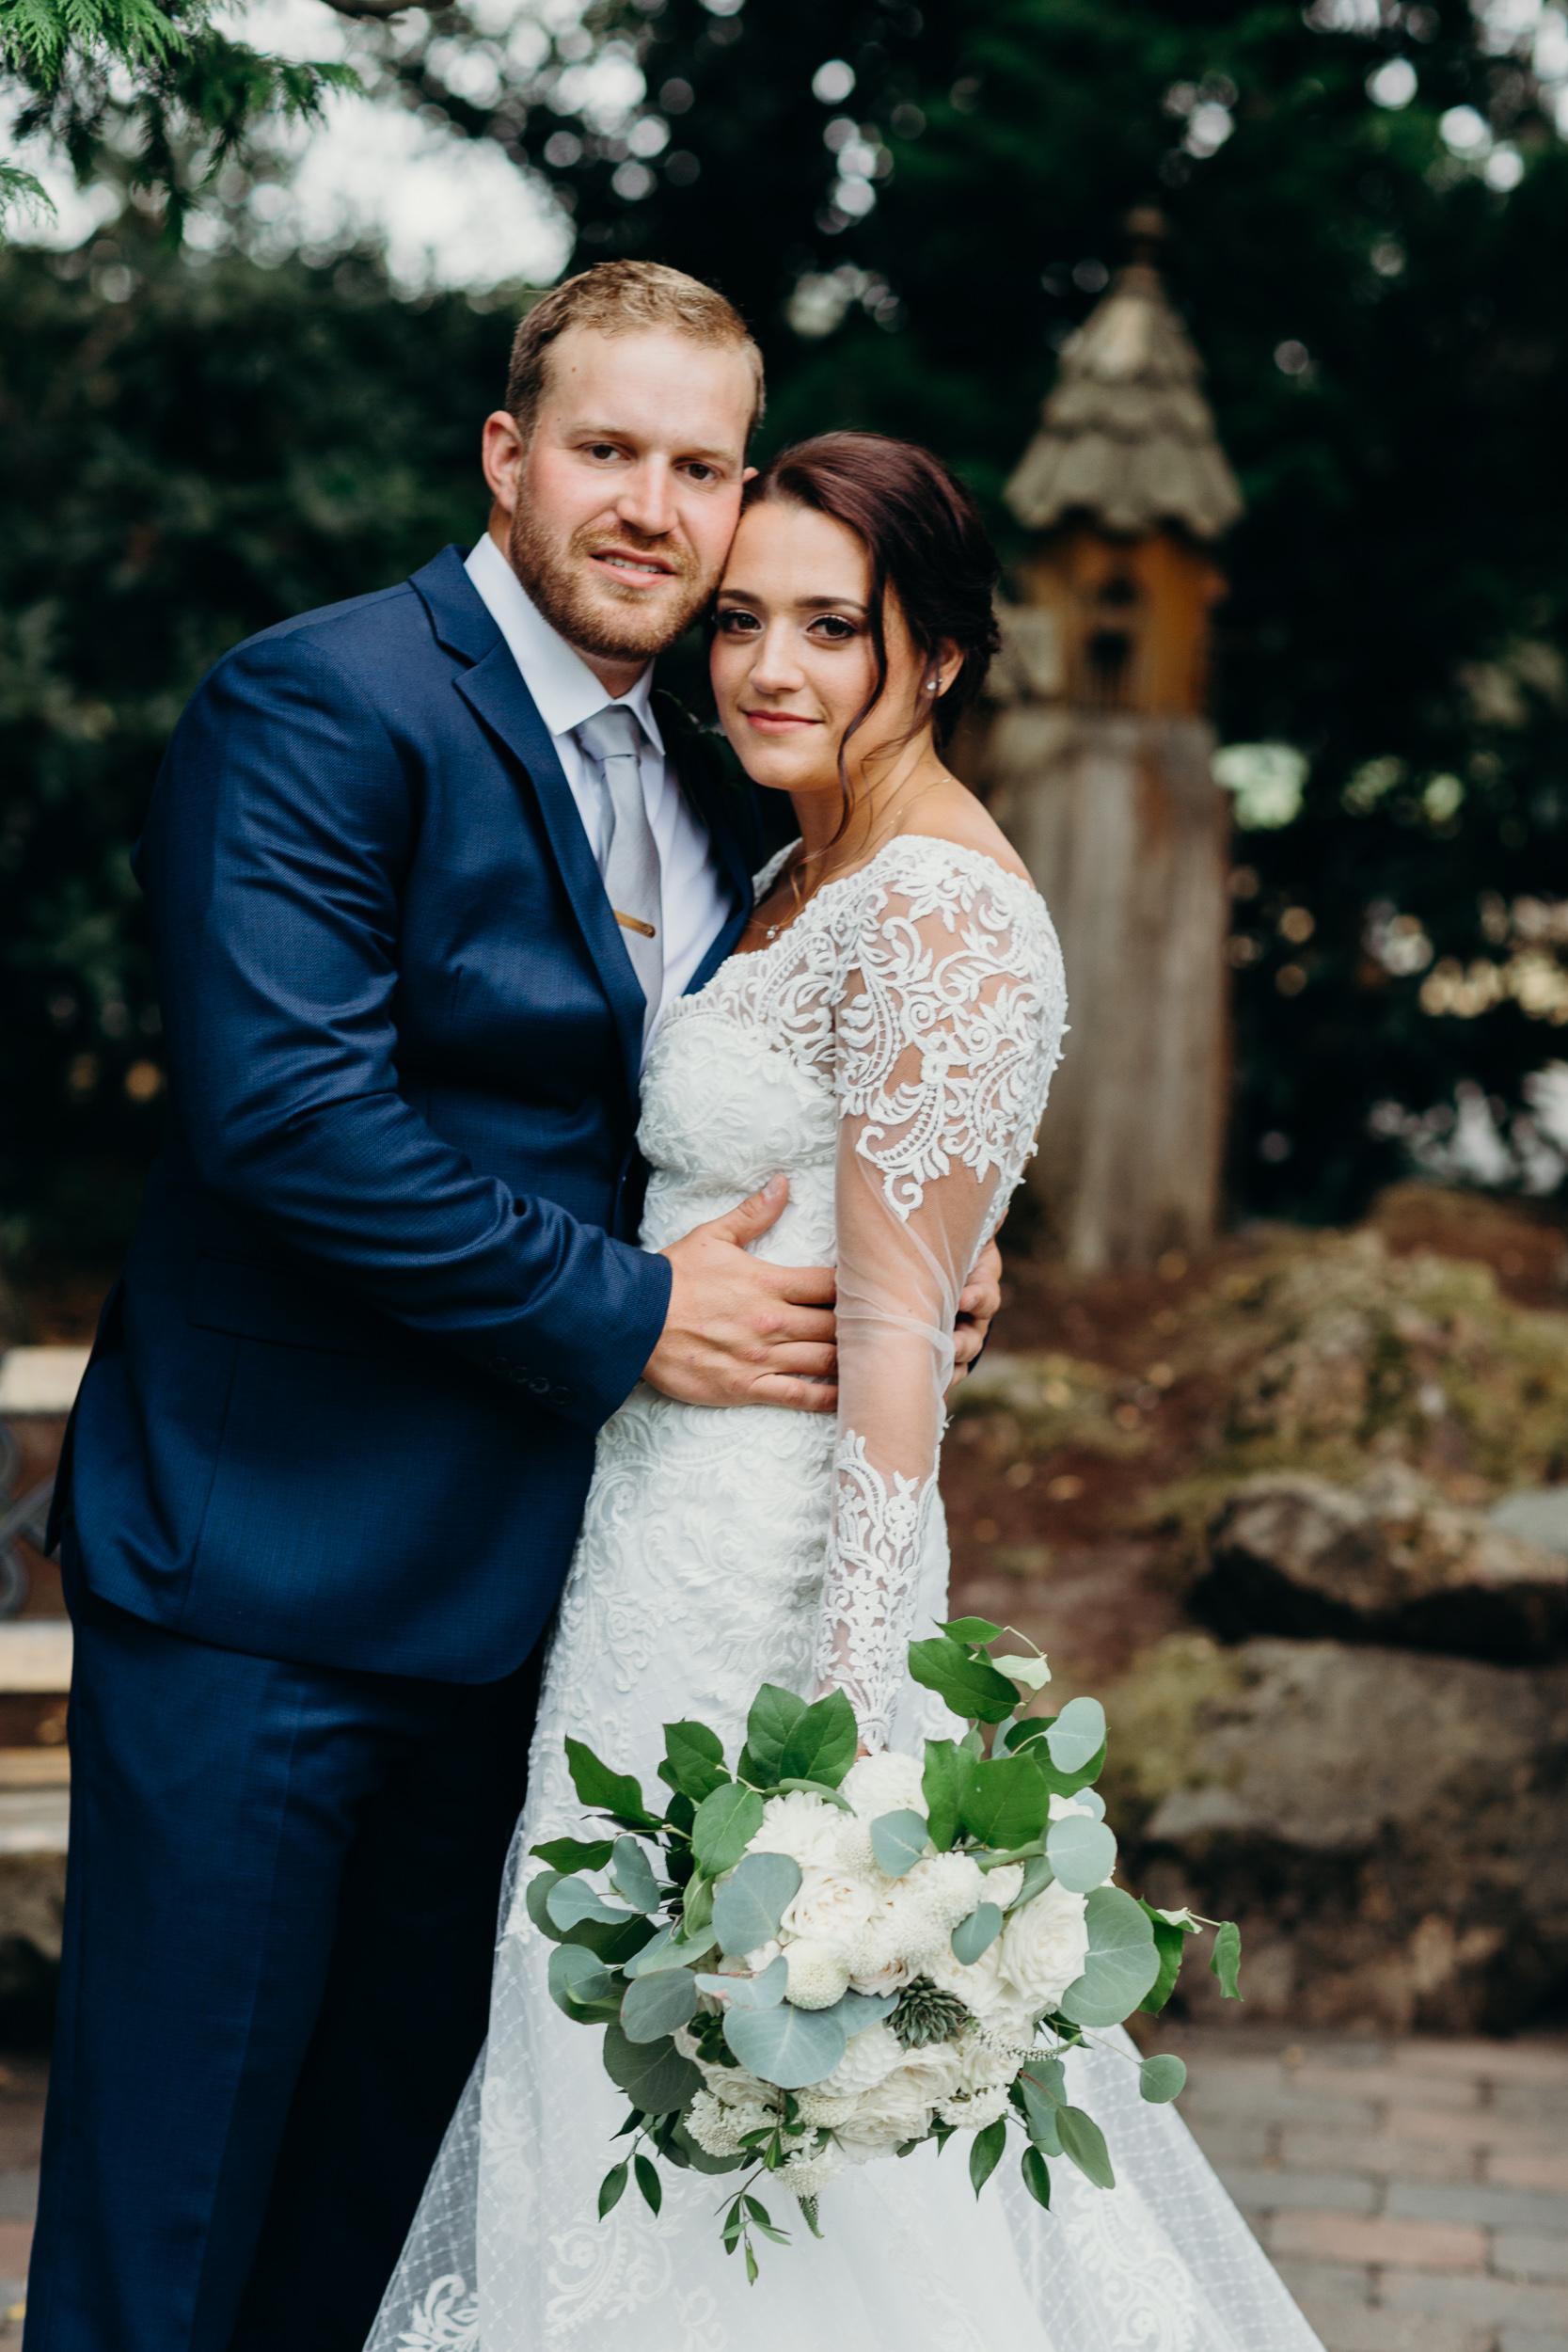 20170820 Savanna & Vince Wedding 1558.jpg